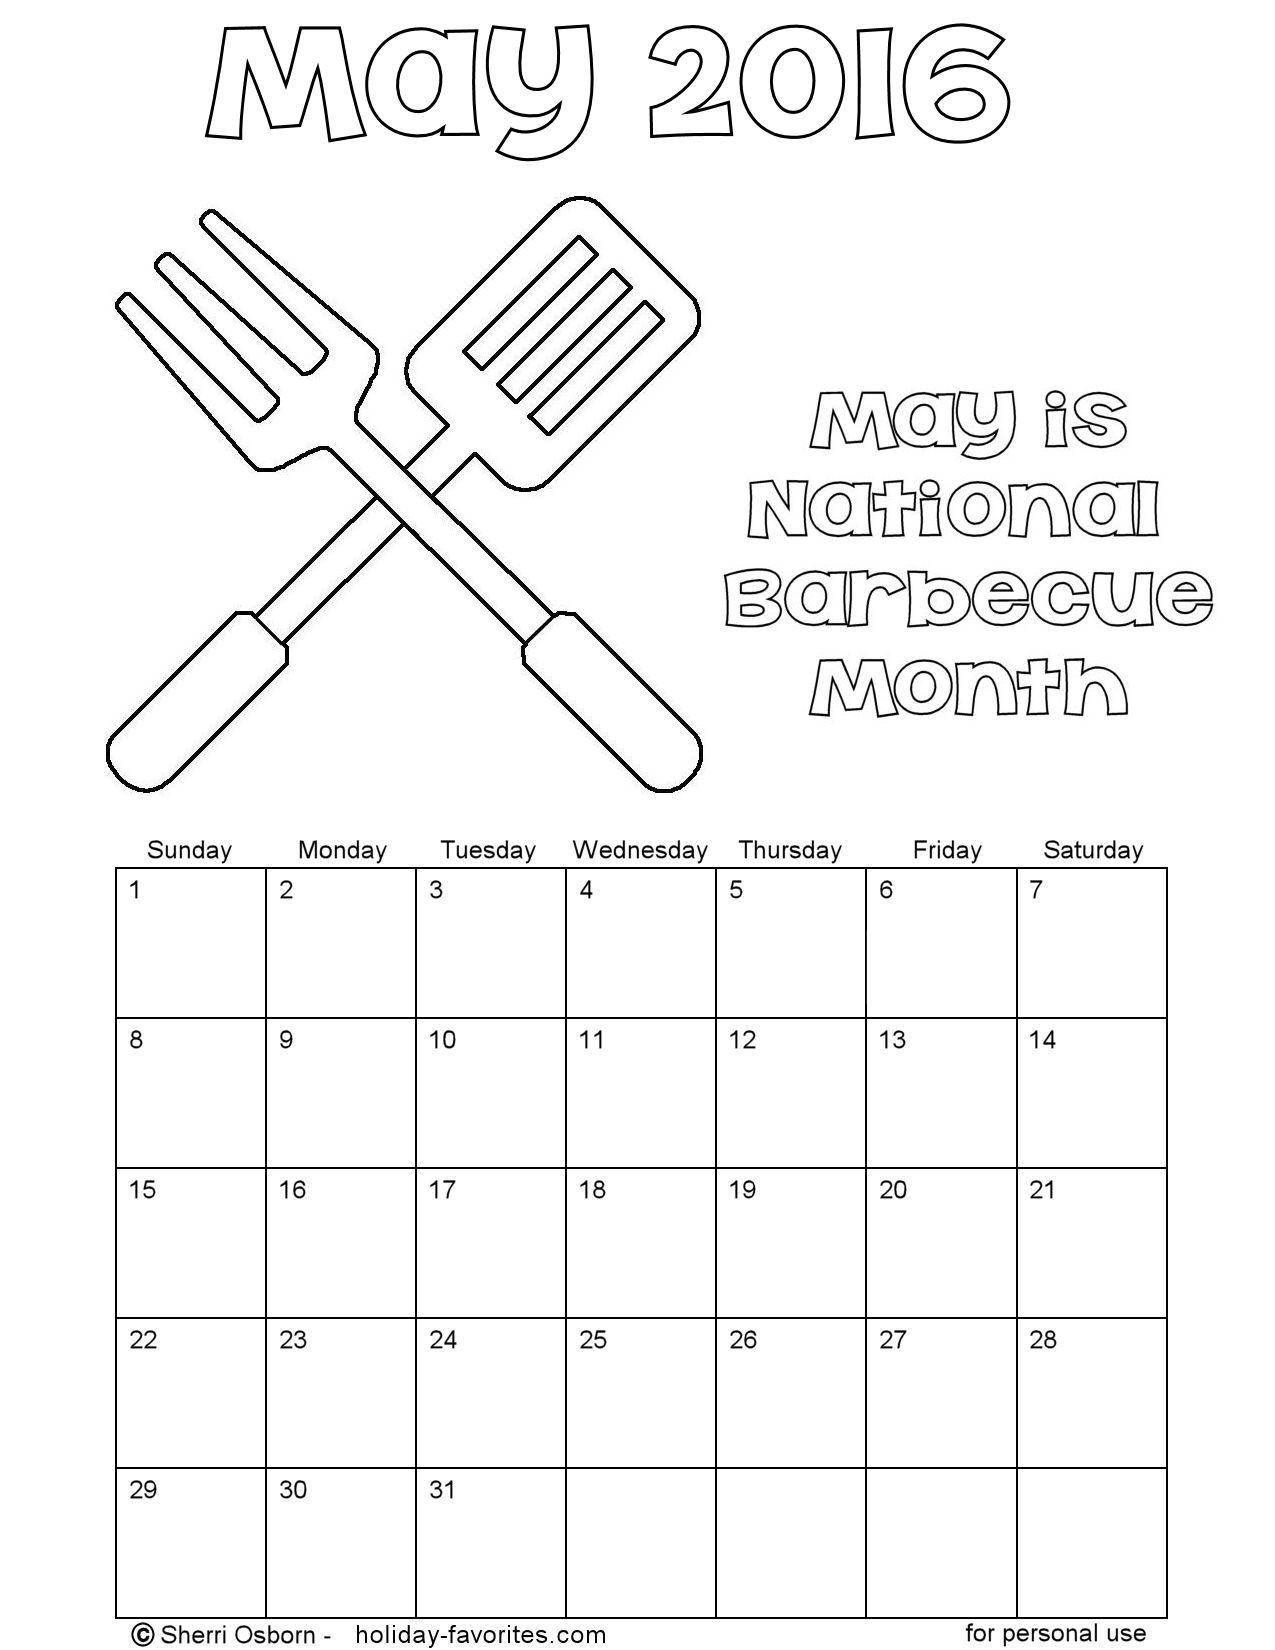 Printable May 2016 Bbq Color Calendar Holiday Favorites